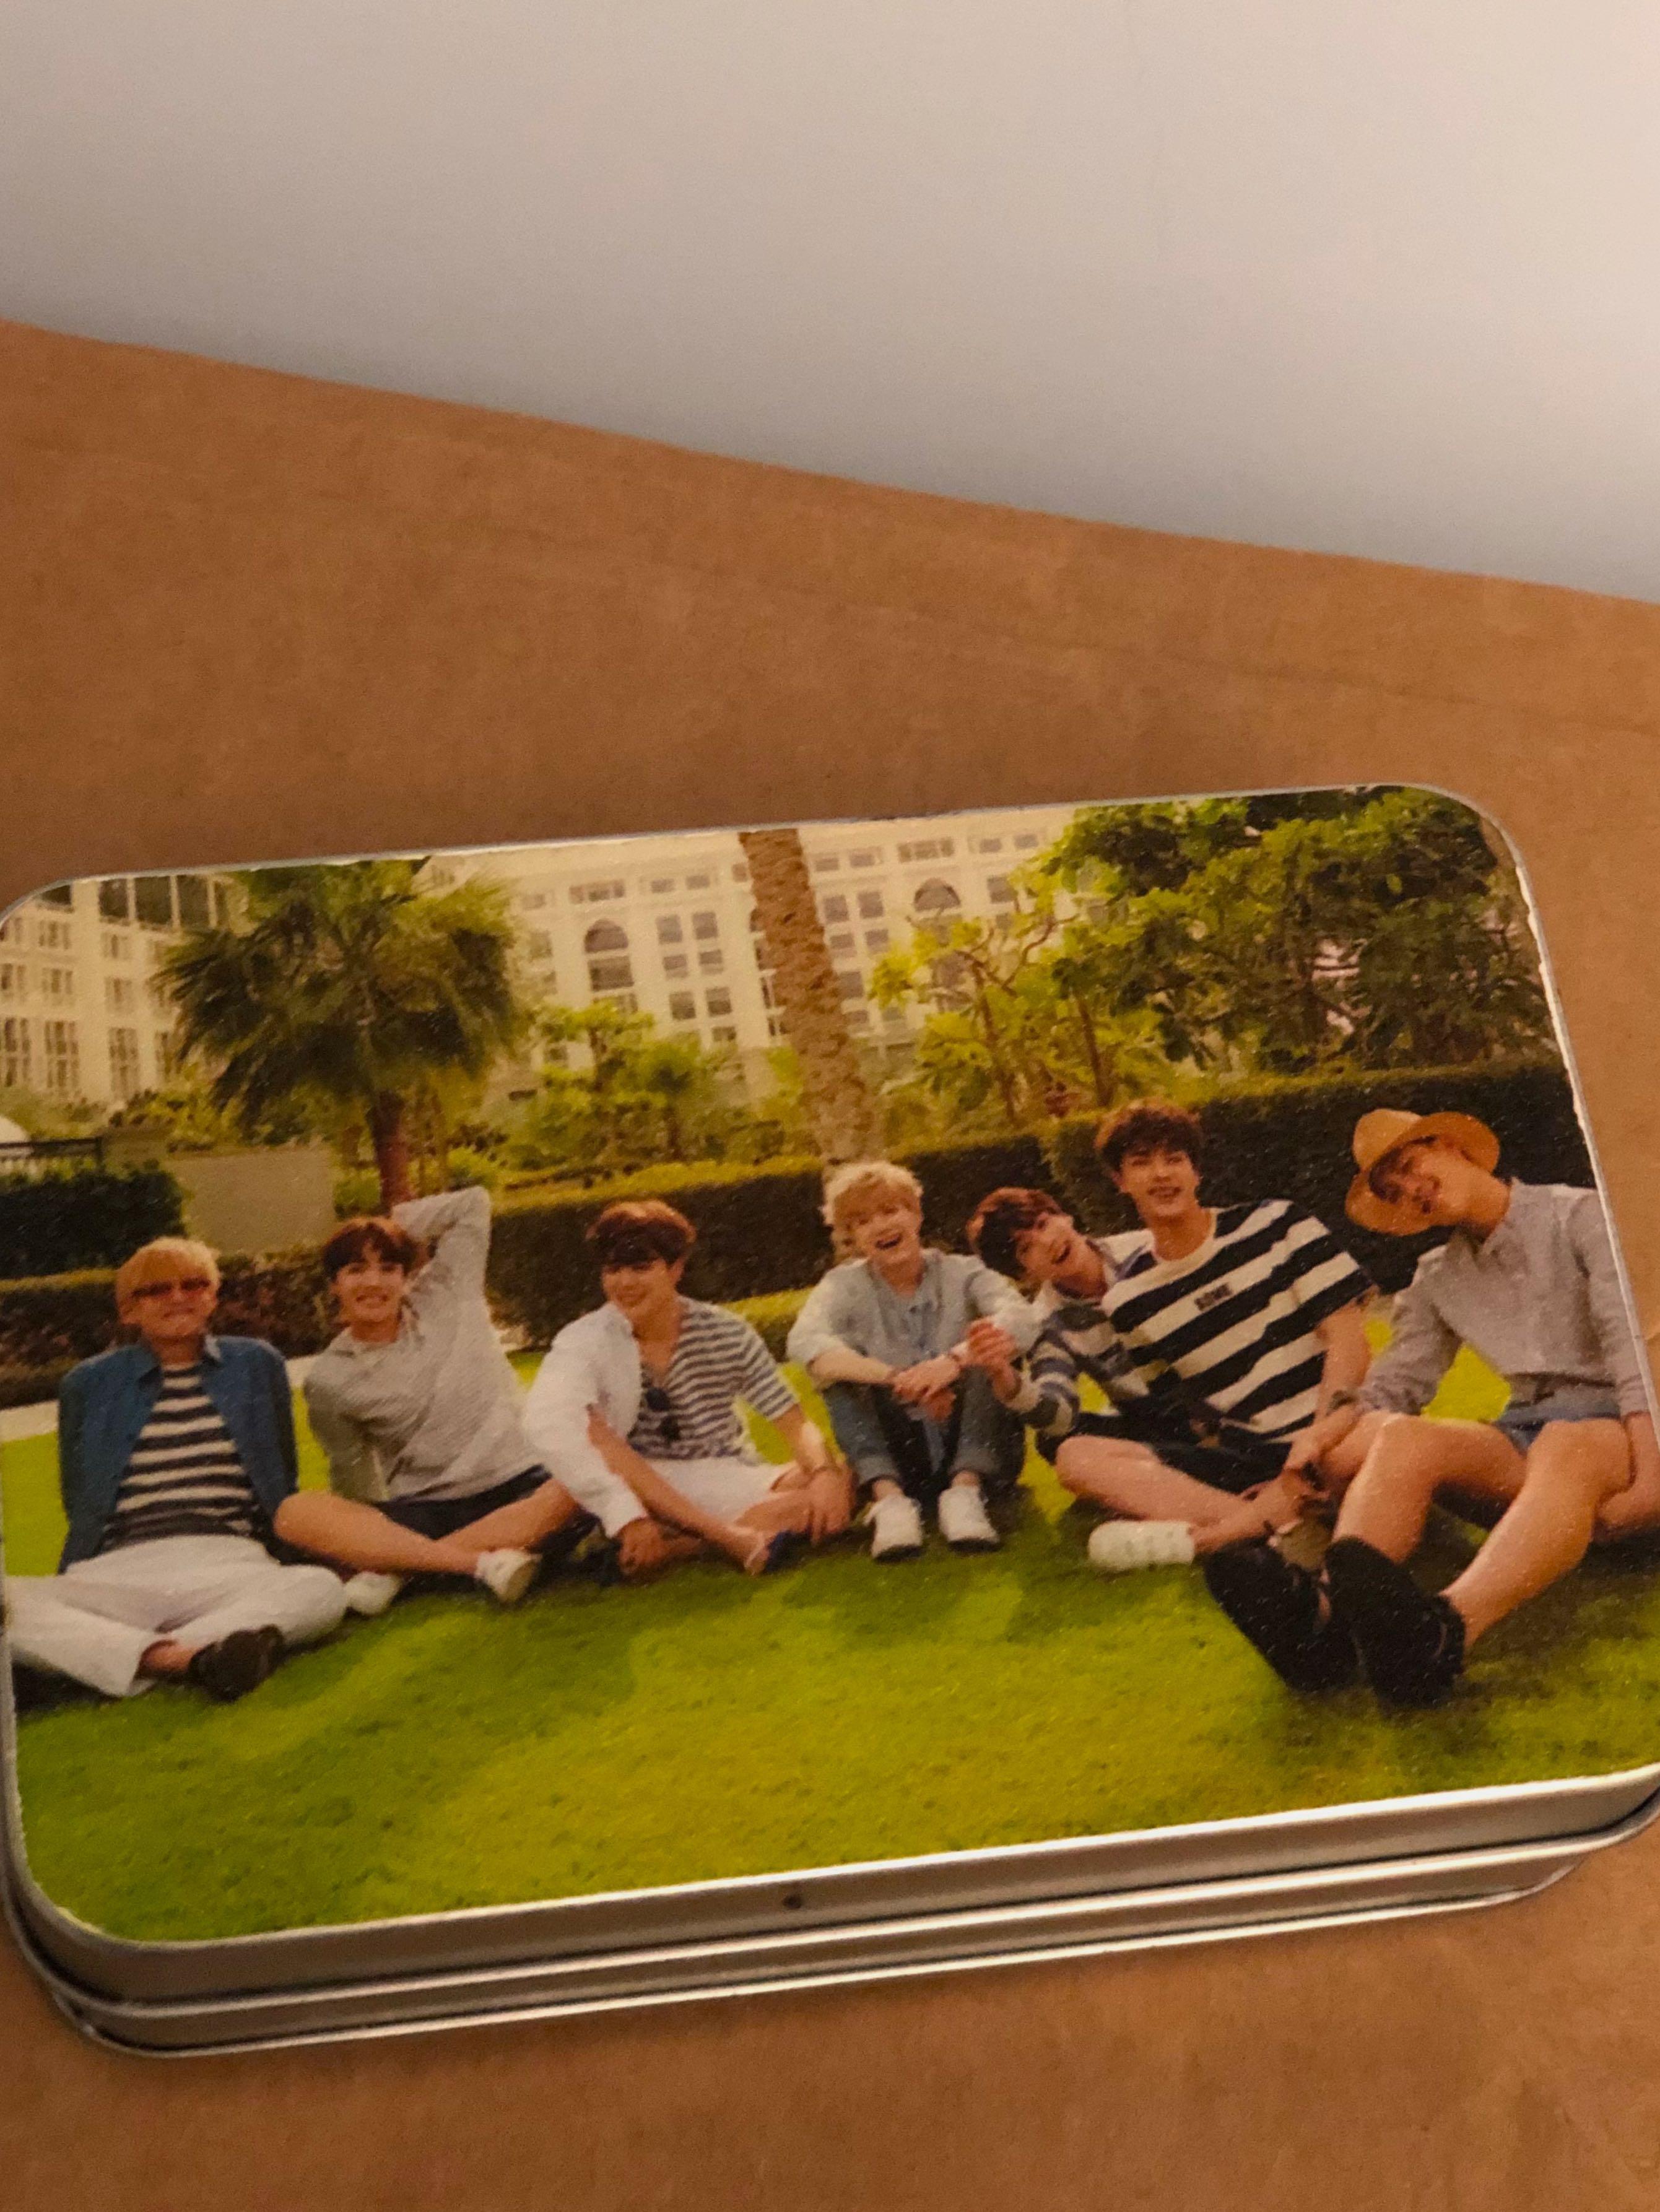 BTS 超可愛小卡鐵盒組